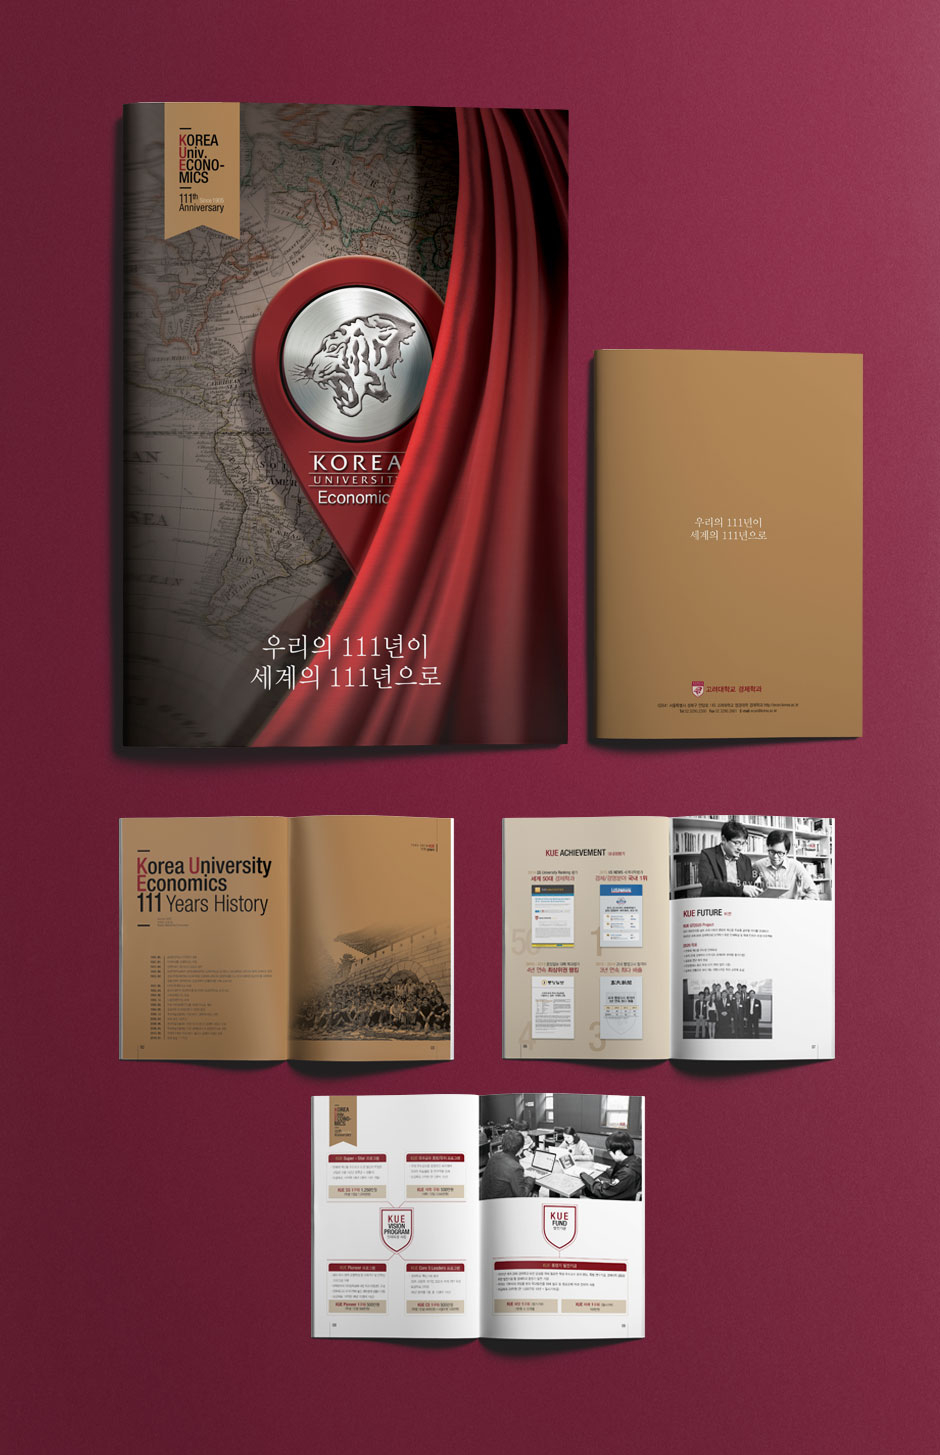 Korea-University-Economics_brochure